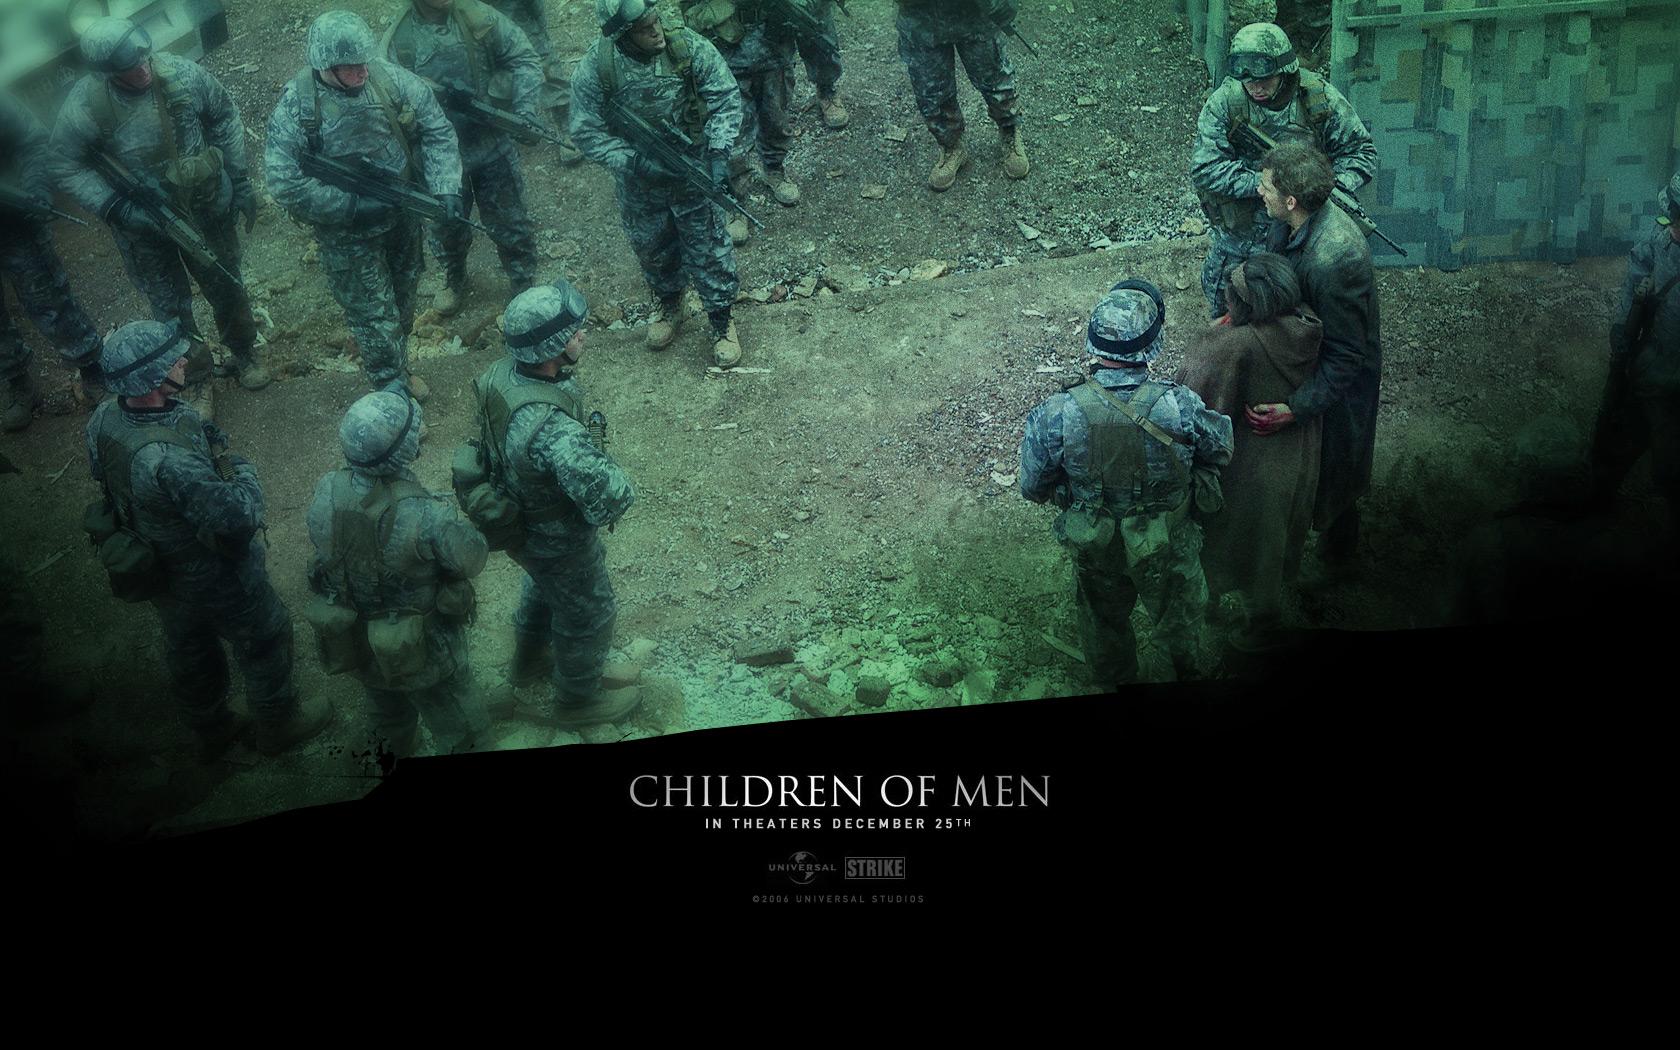 Children Of Men Wallpaper